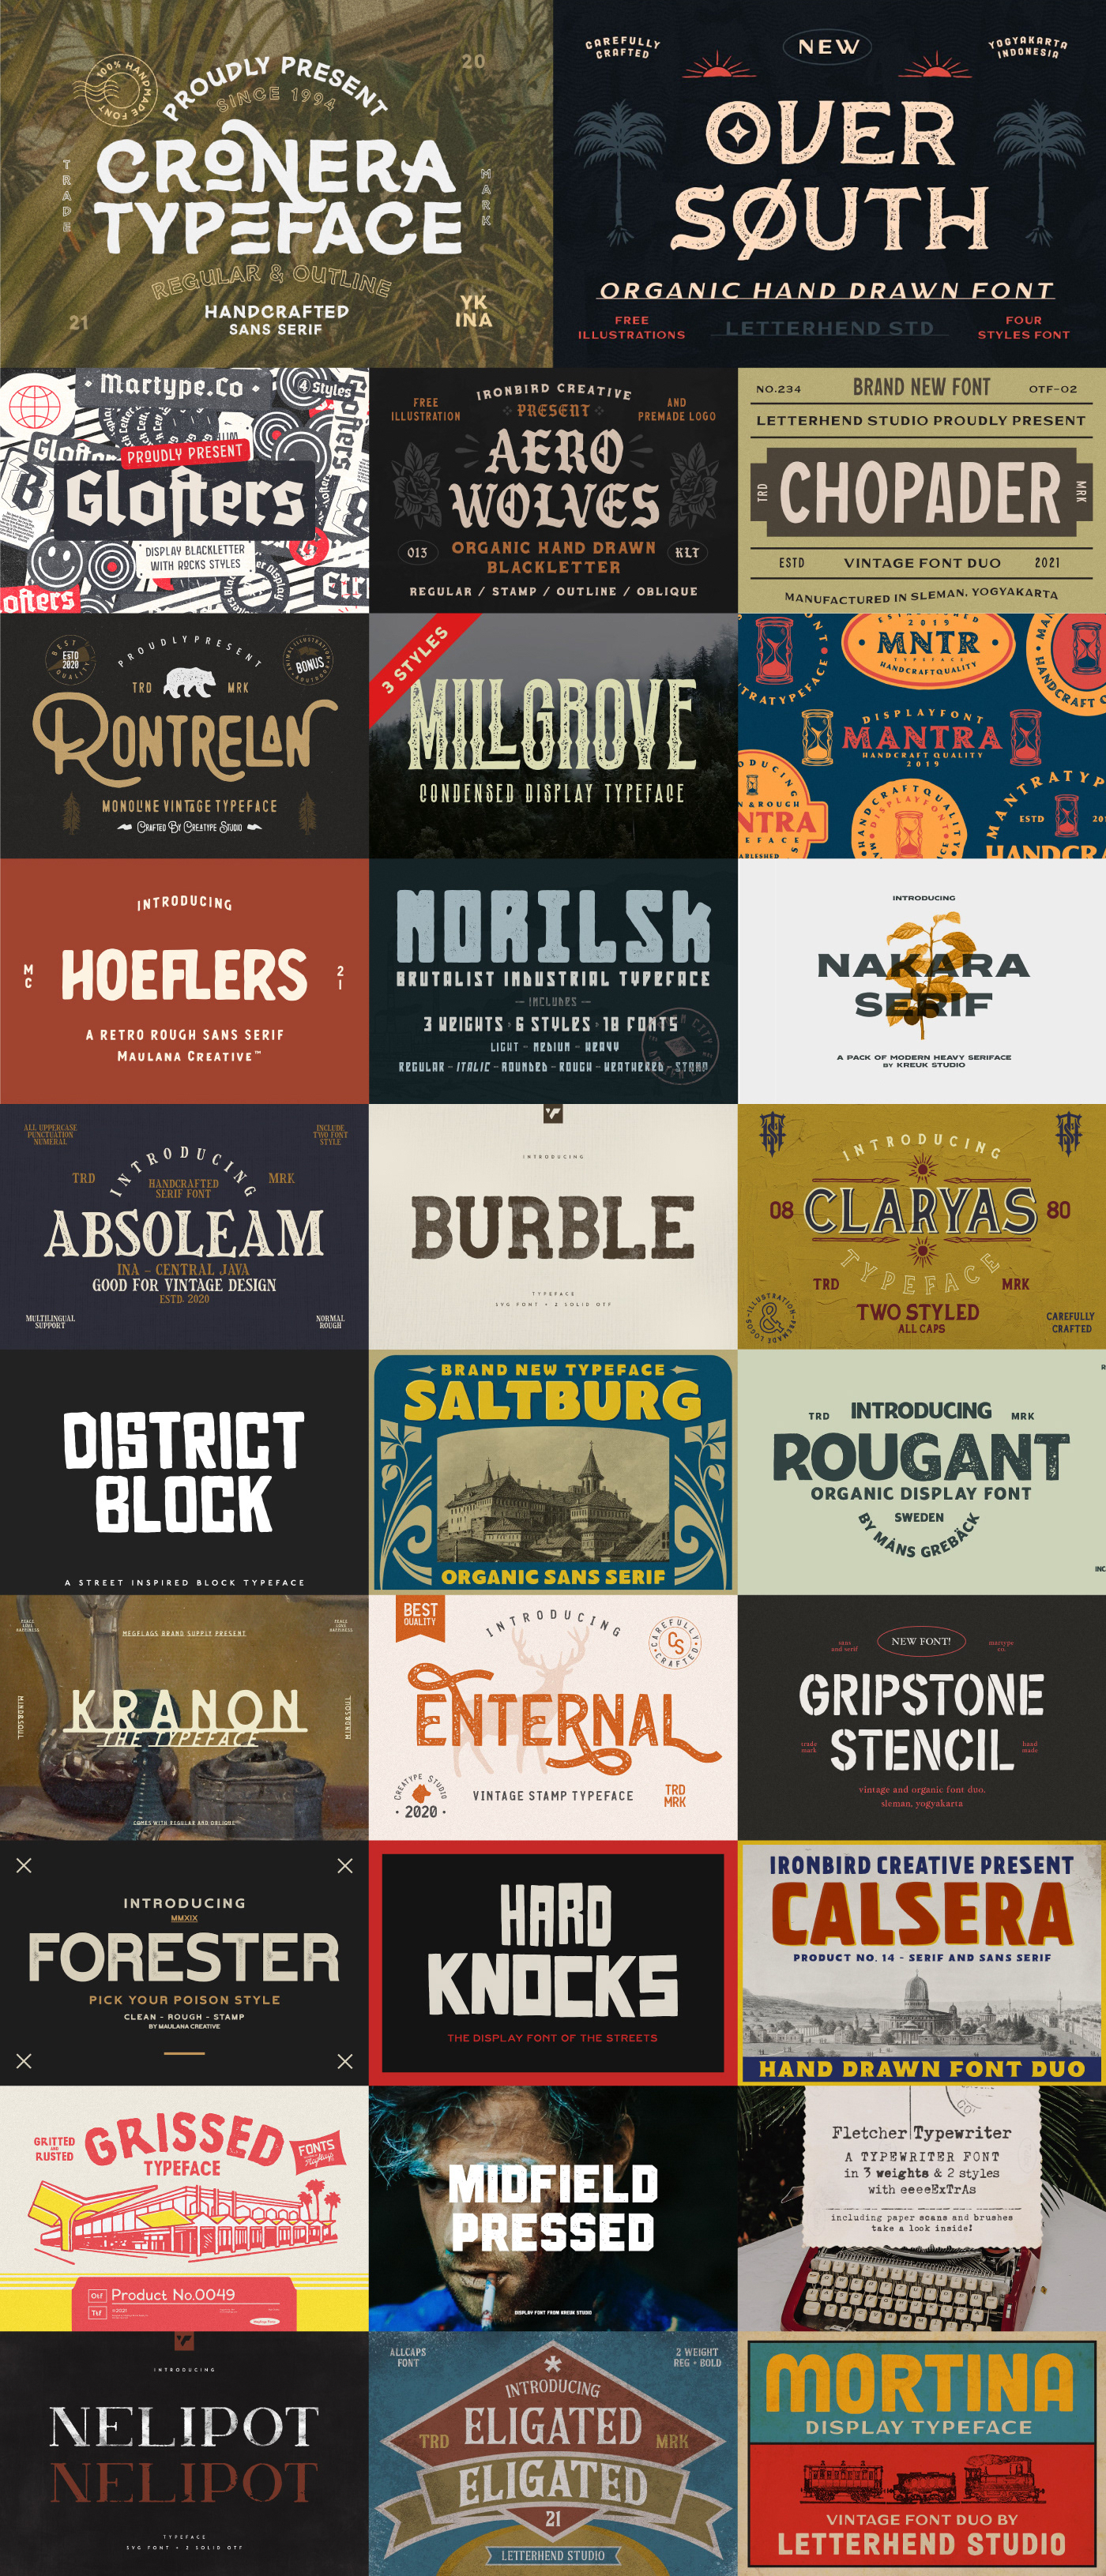 branding  bundle free Free font ILLUSTRATION  logo Retro rough texture vintage